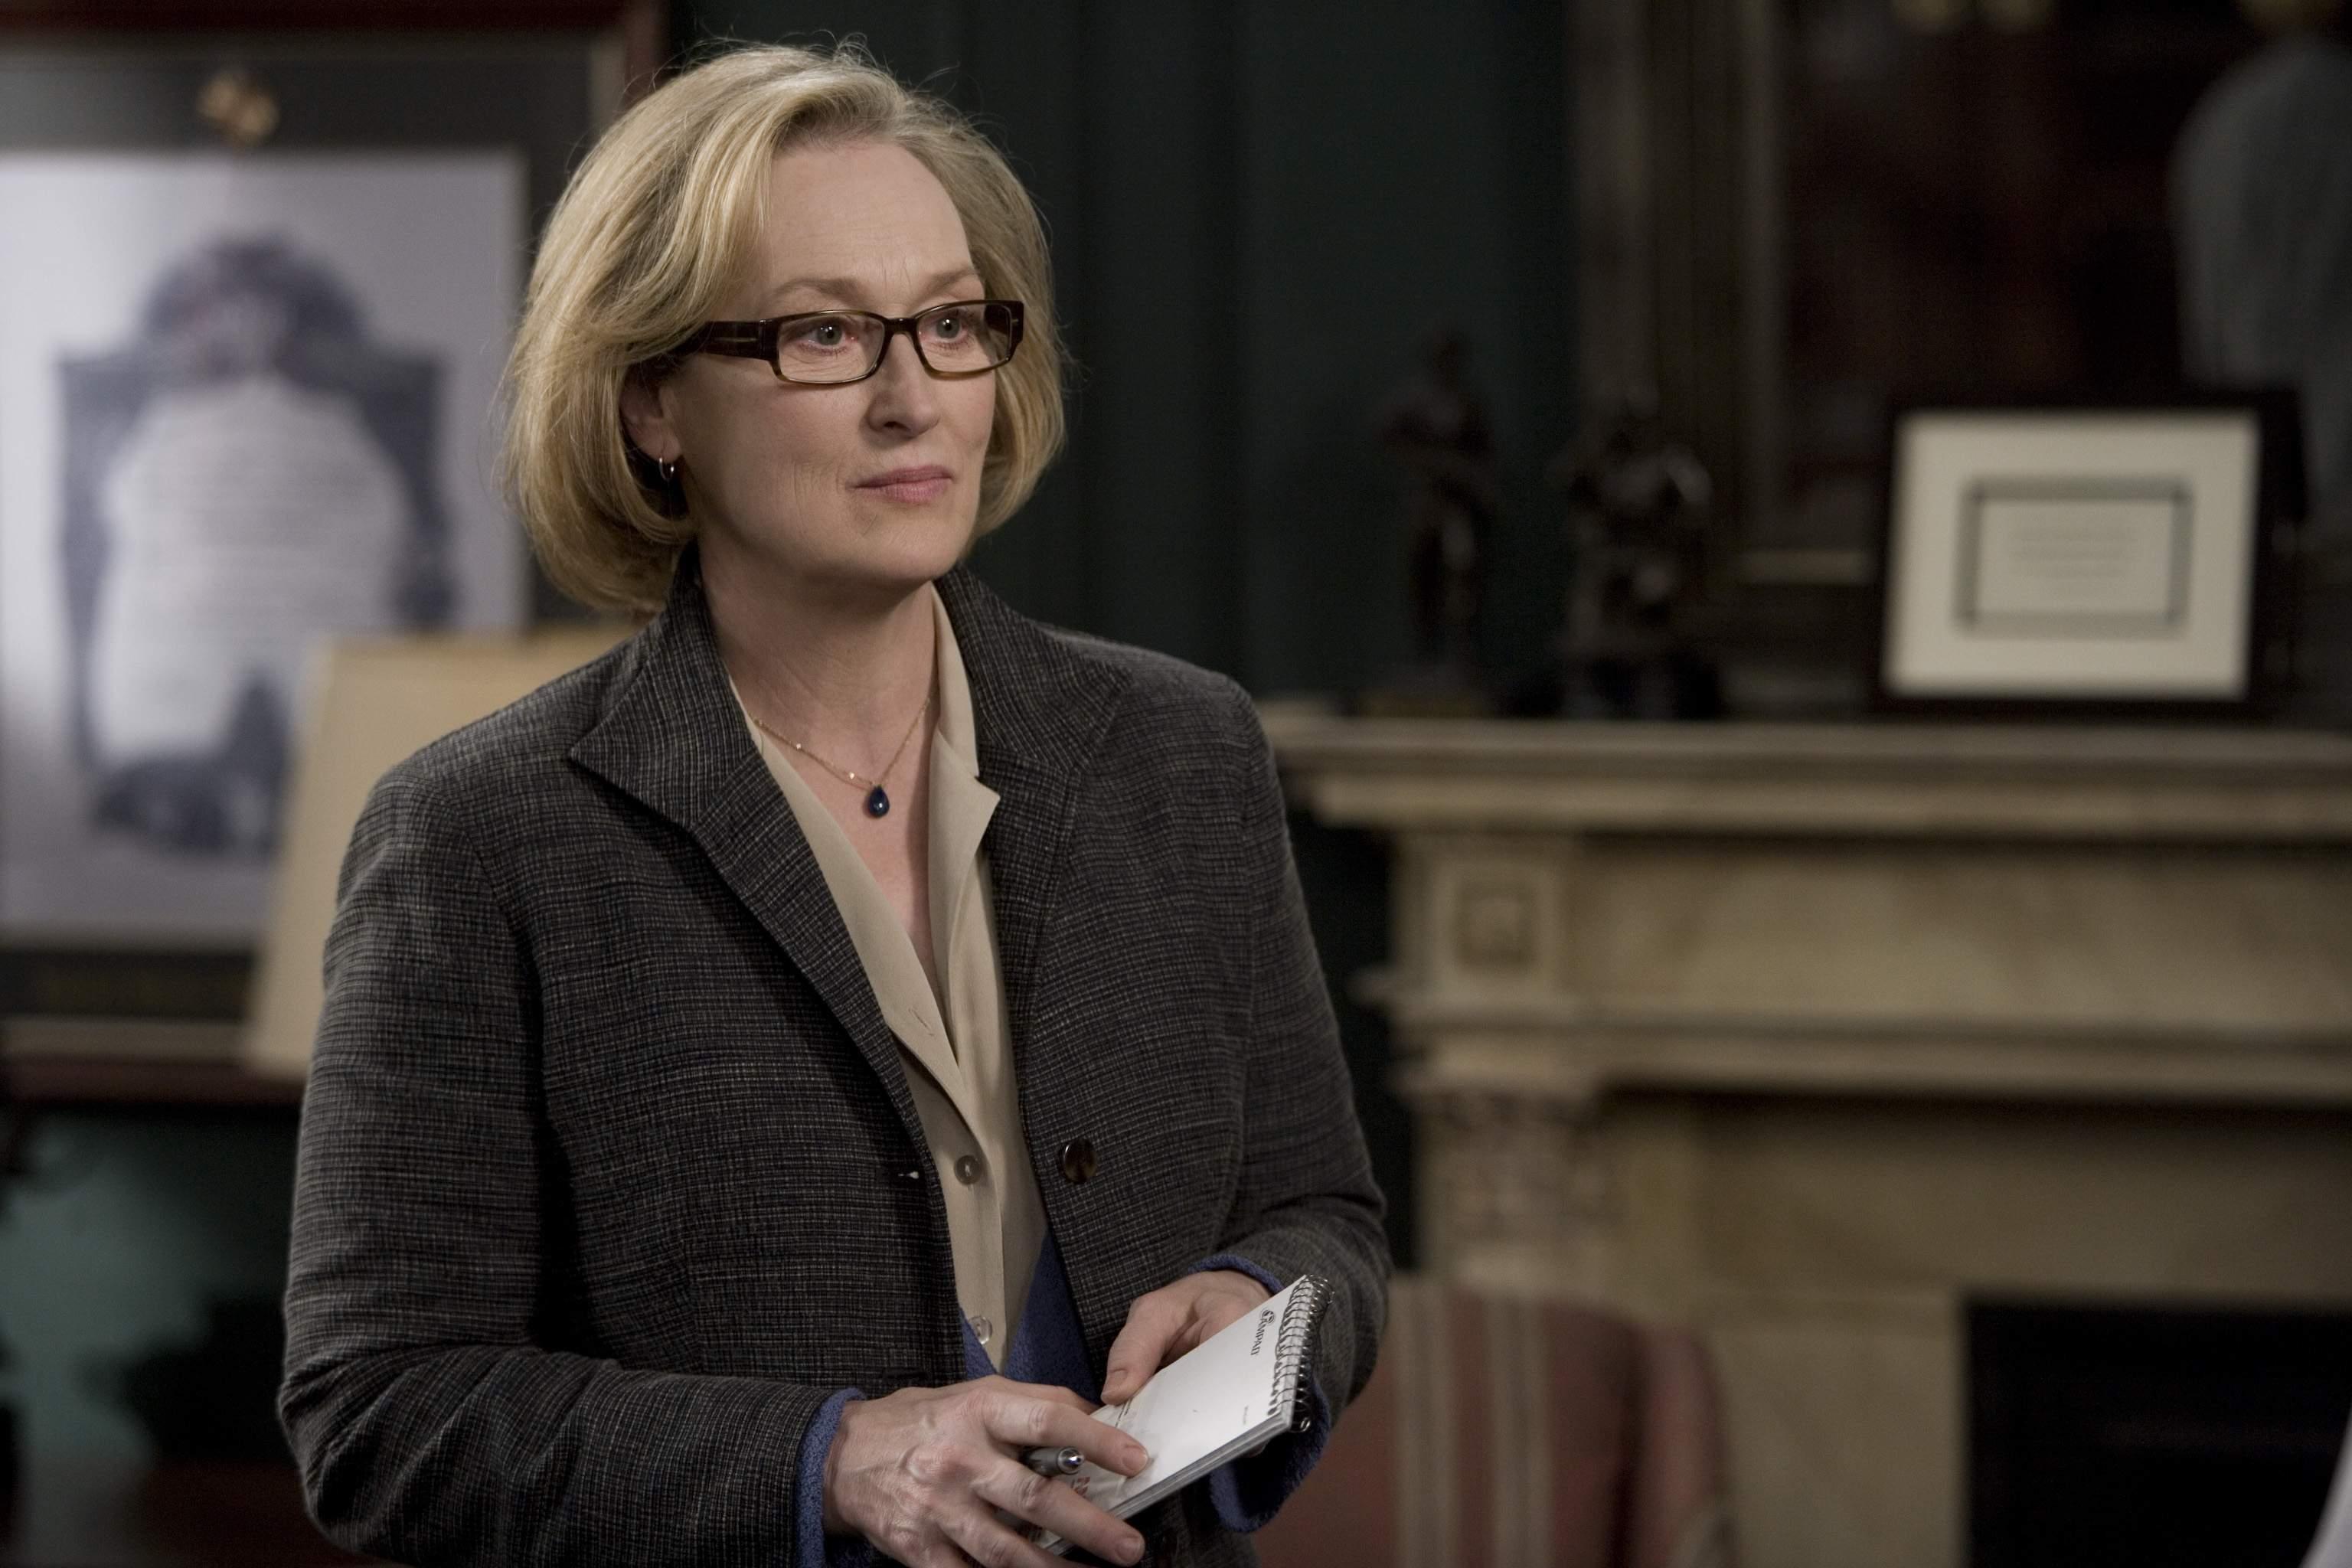 Meryl Streep on Tubi TV: Lions for Lambs